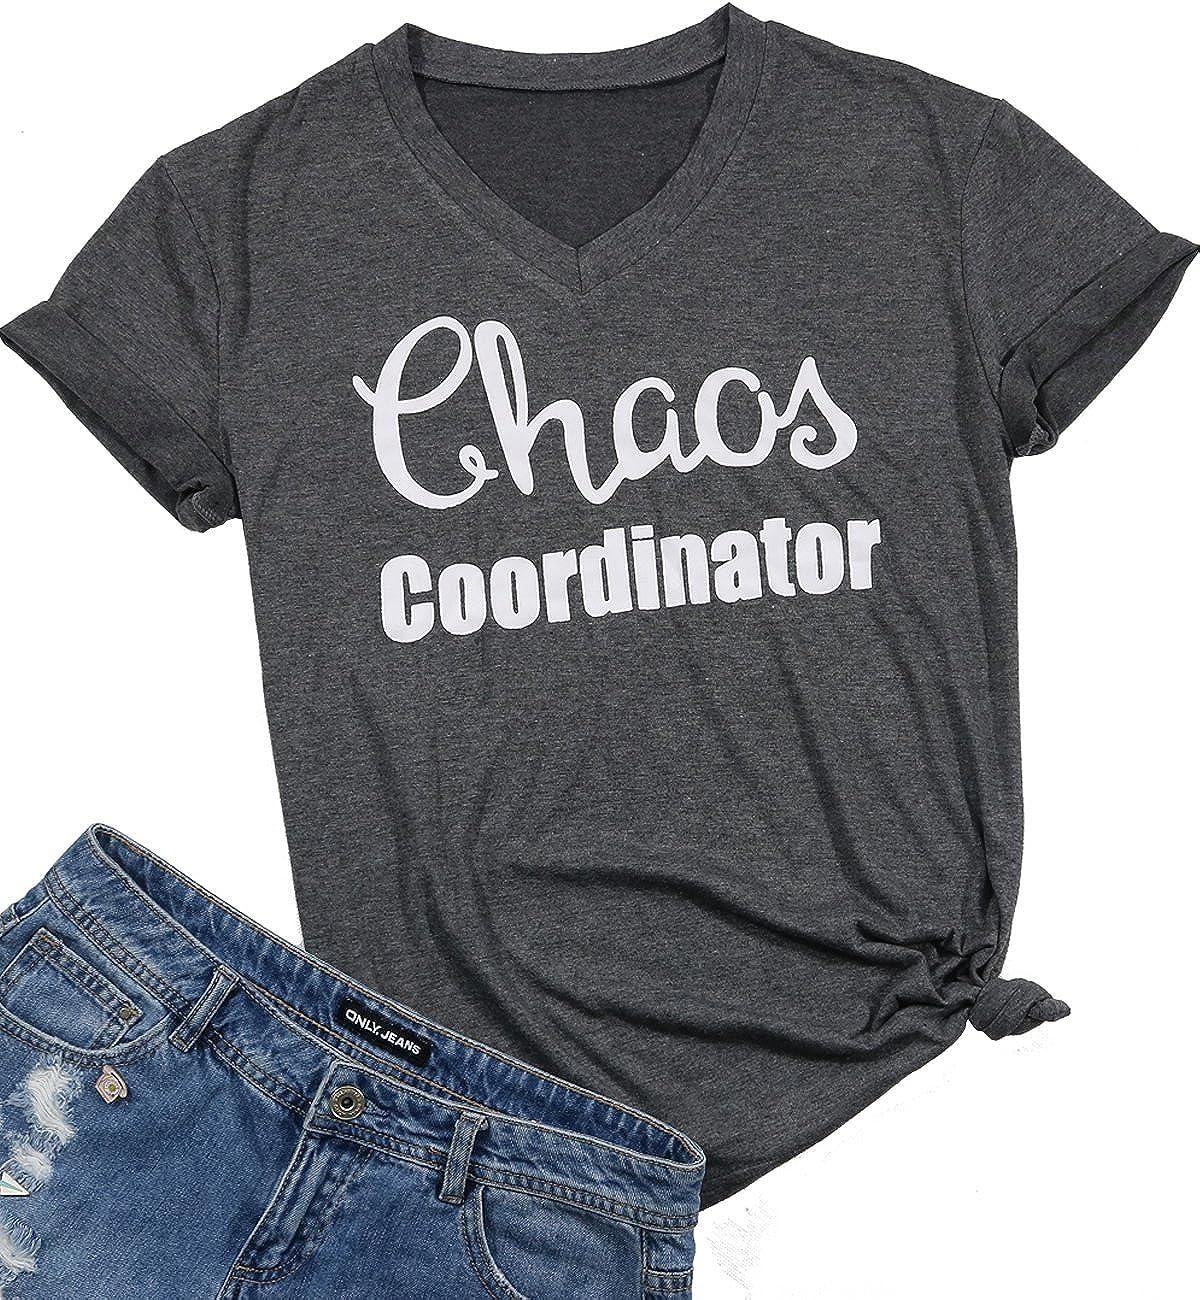 c36e69f78 Amazon.com: Chaos Coordinator Shirt Women Funny Letter Print T-Shirt Tees  Casual Loose Short Sleeve Tops Blouse: Clothing